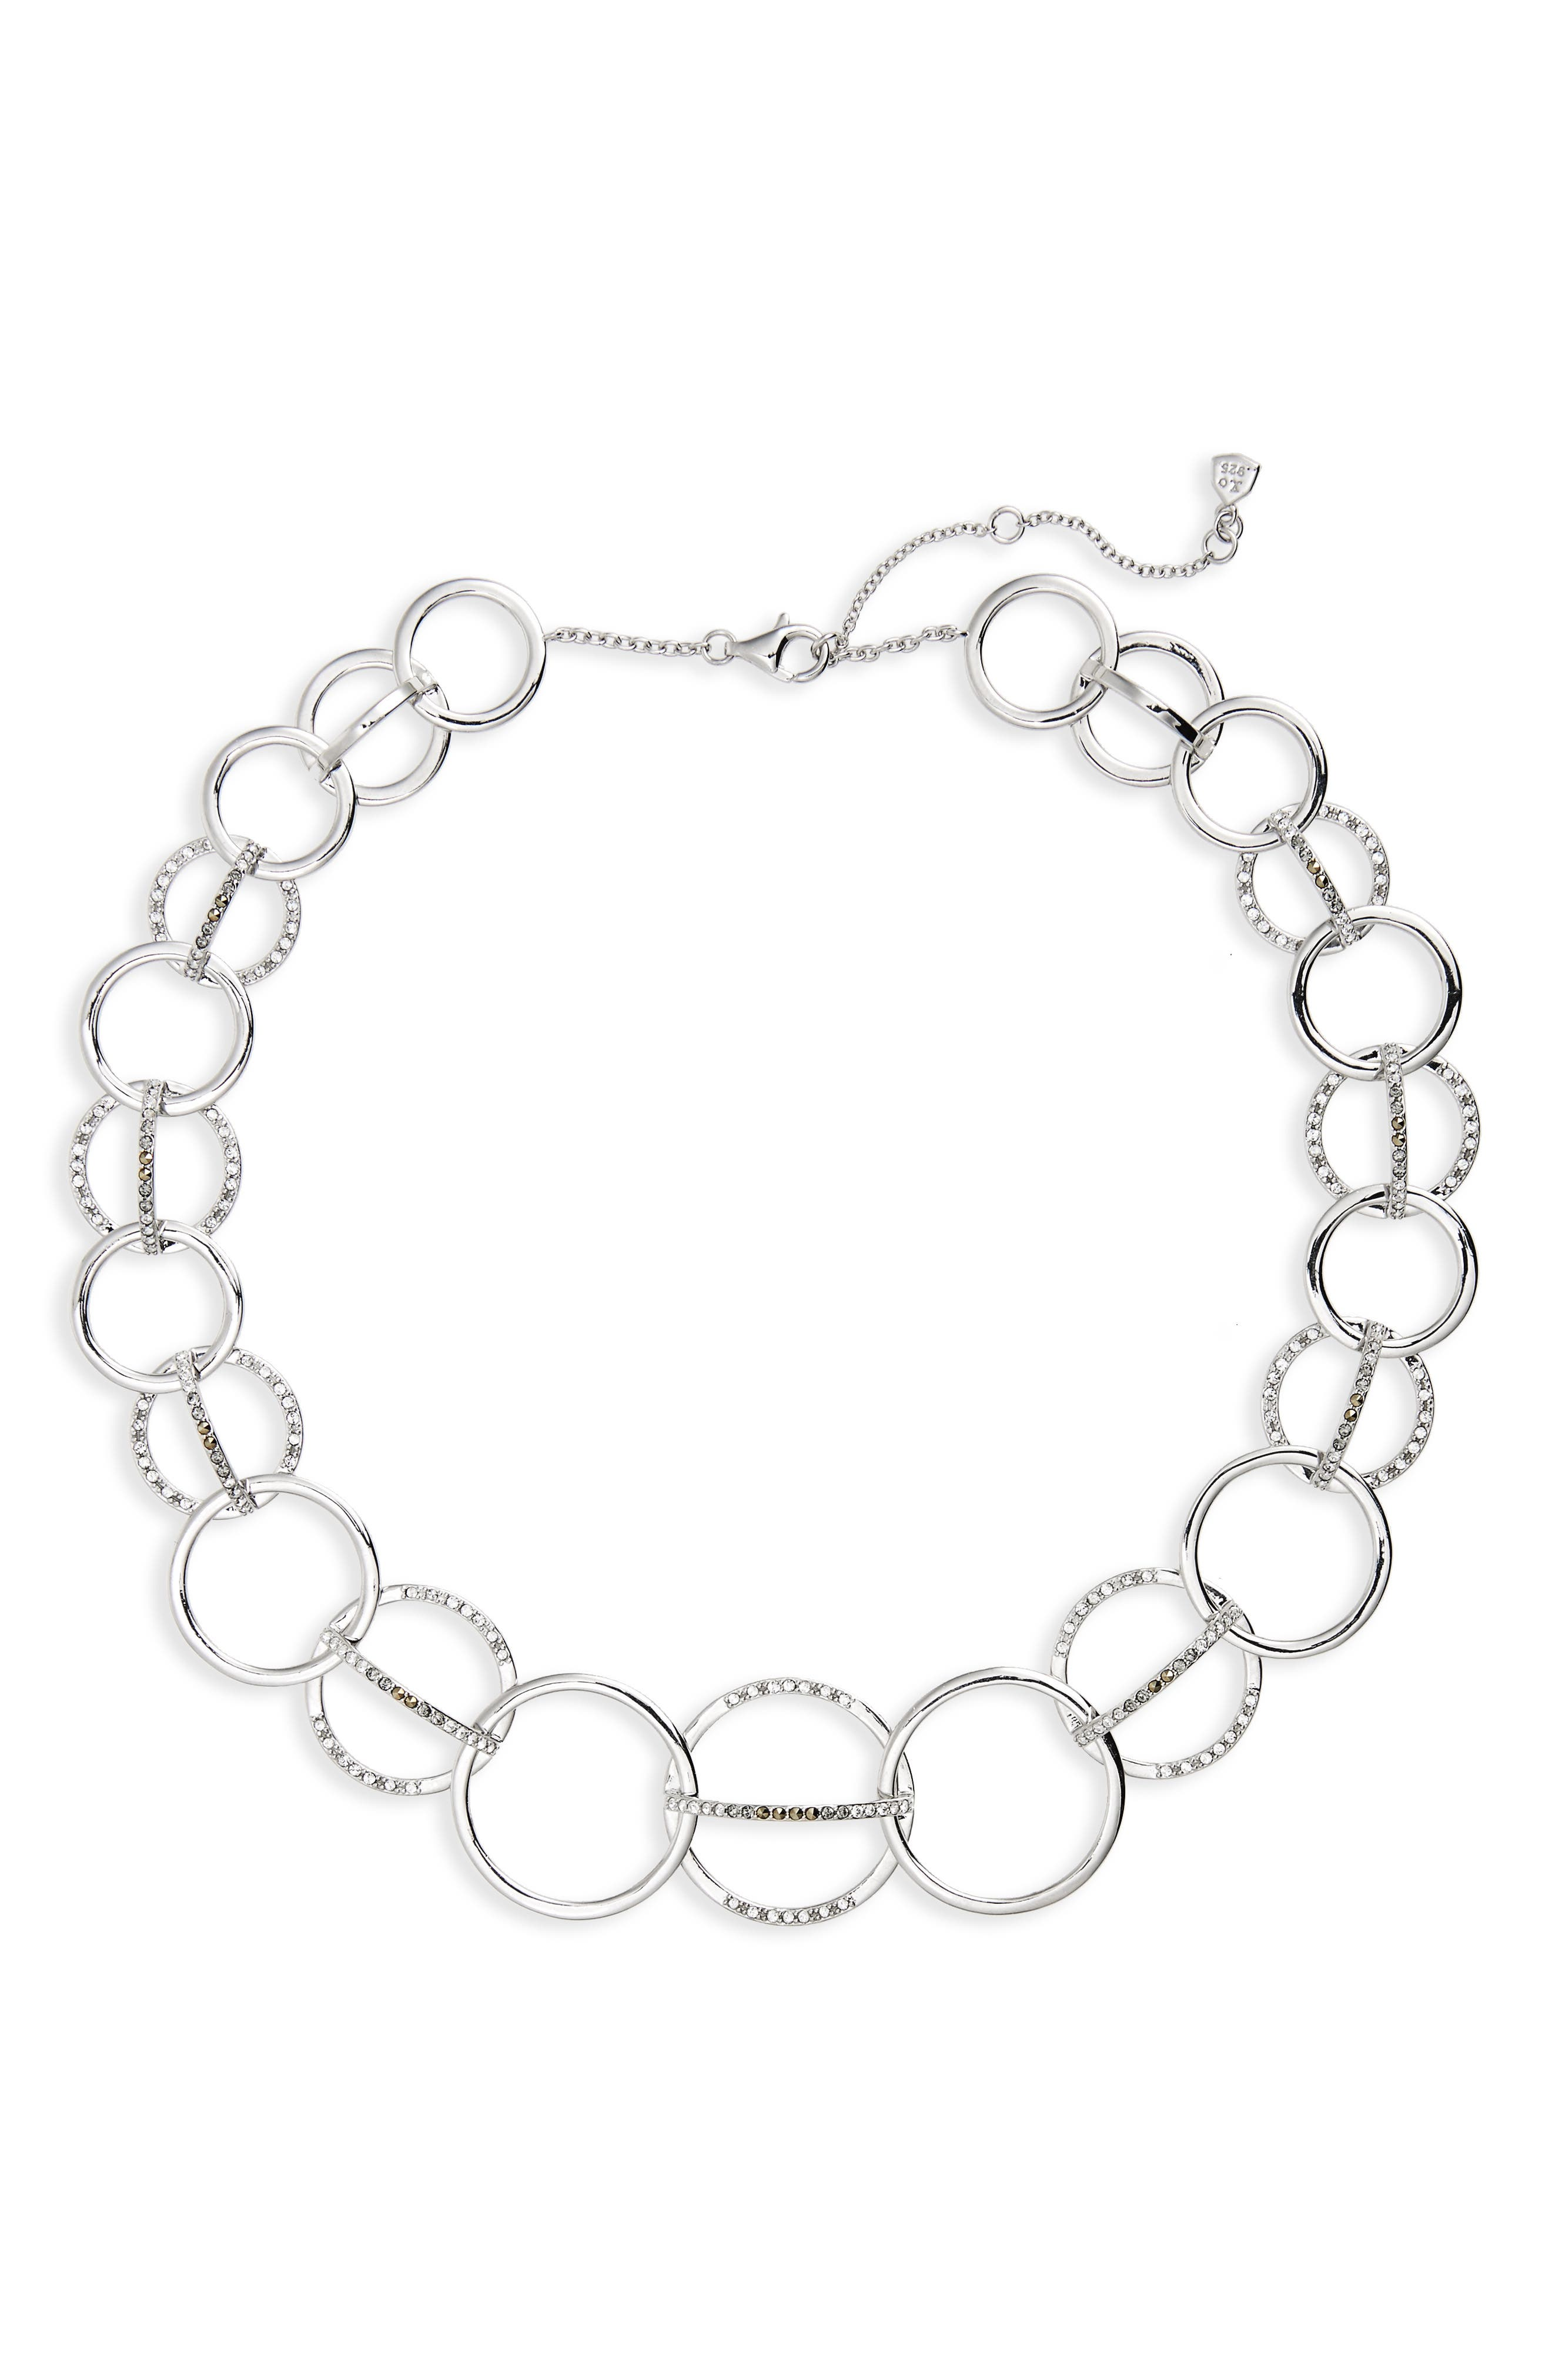 Silver Sparkle Collar Necklace,                         Main,                         color, Black Diamond/ Marcasite